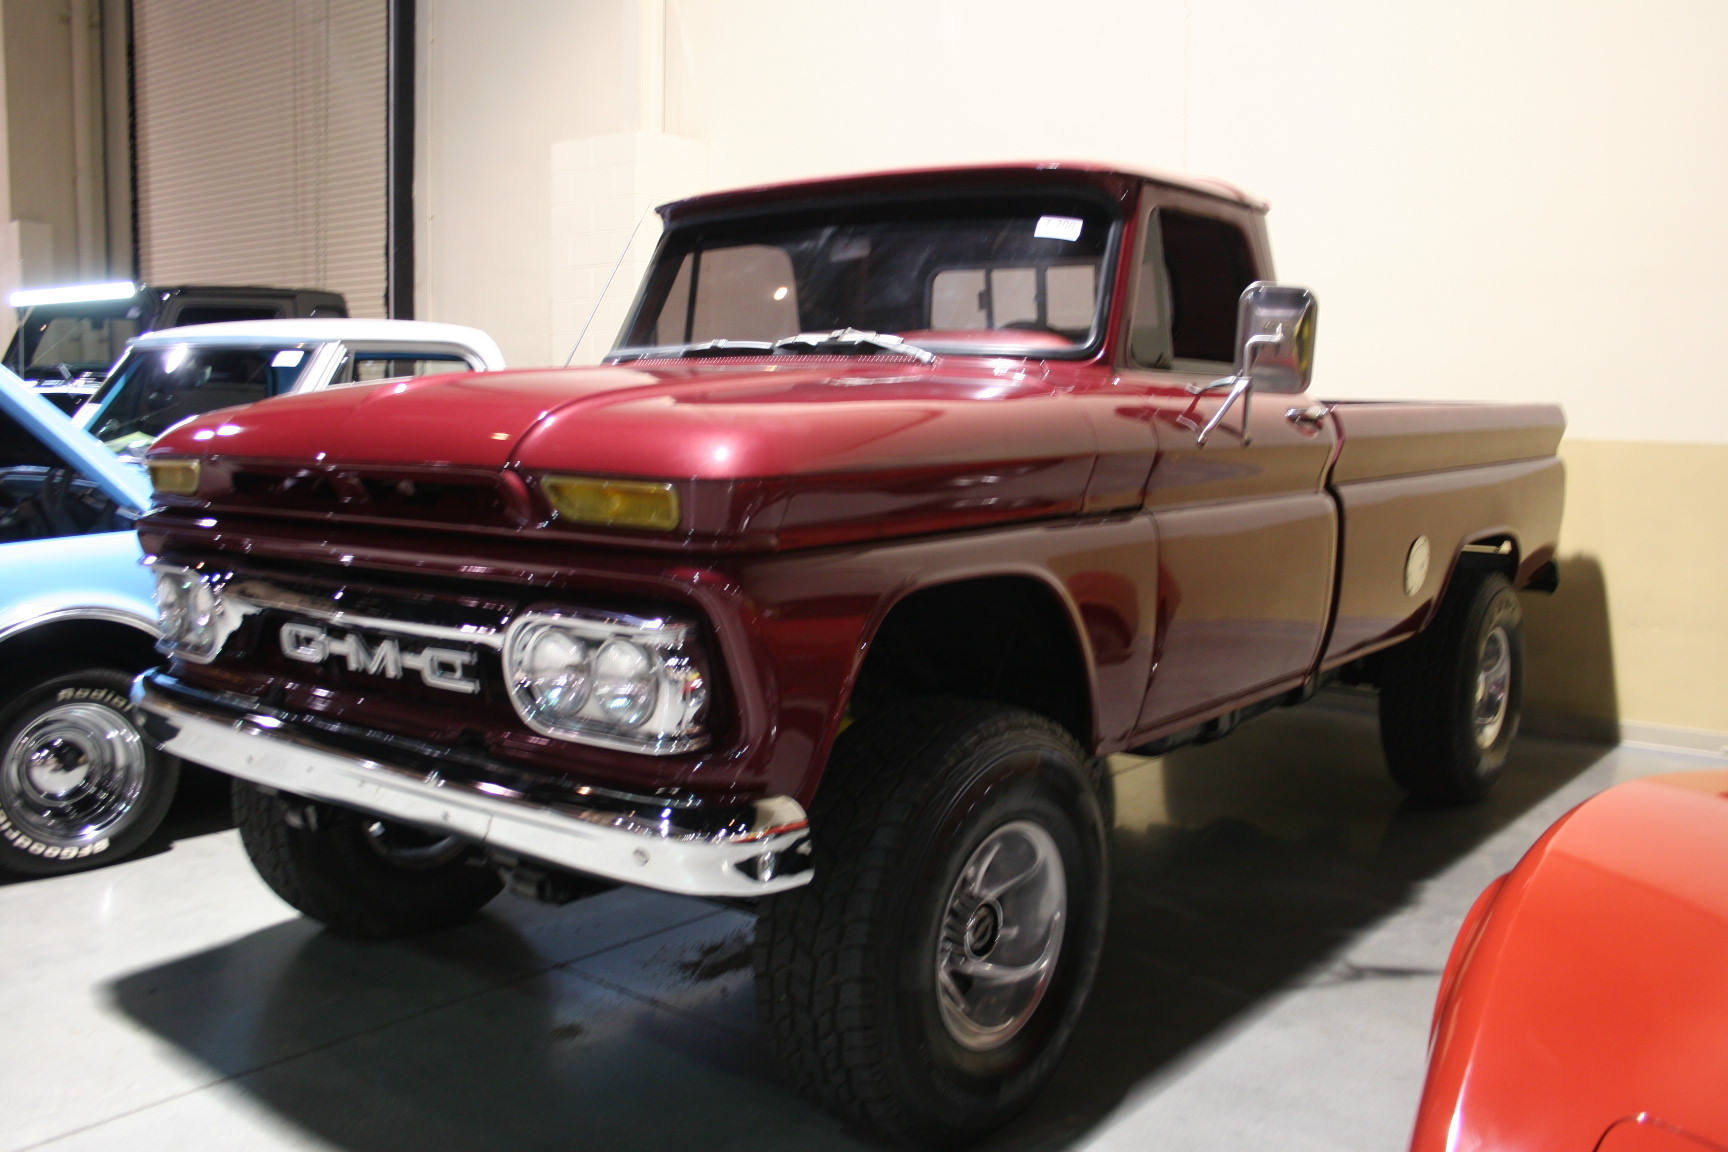 1966 Gmc Truck K2500 For Sale At Vicari Auctions Biloxi 2019